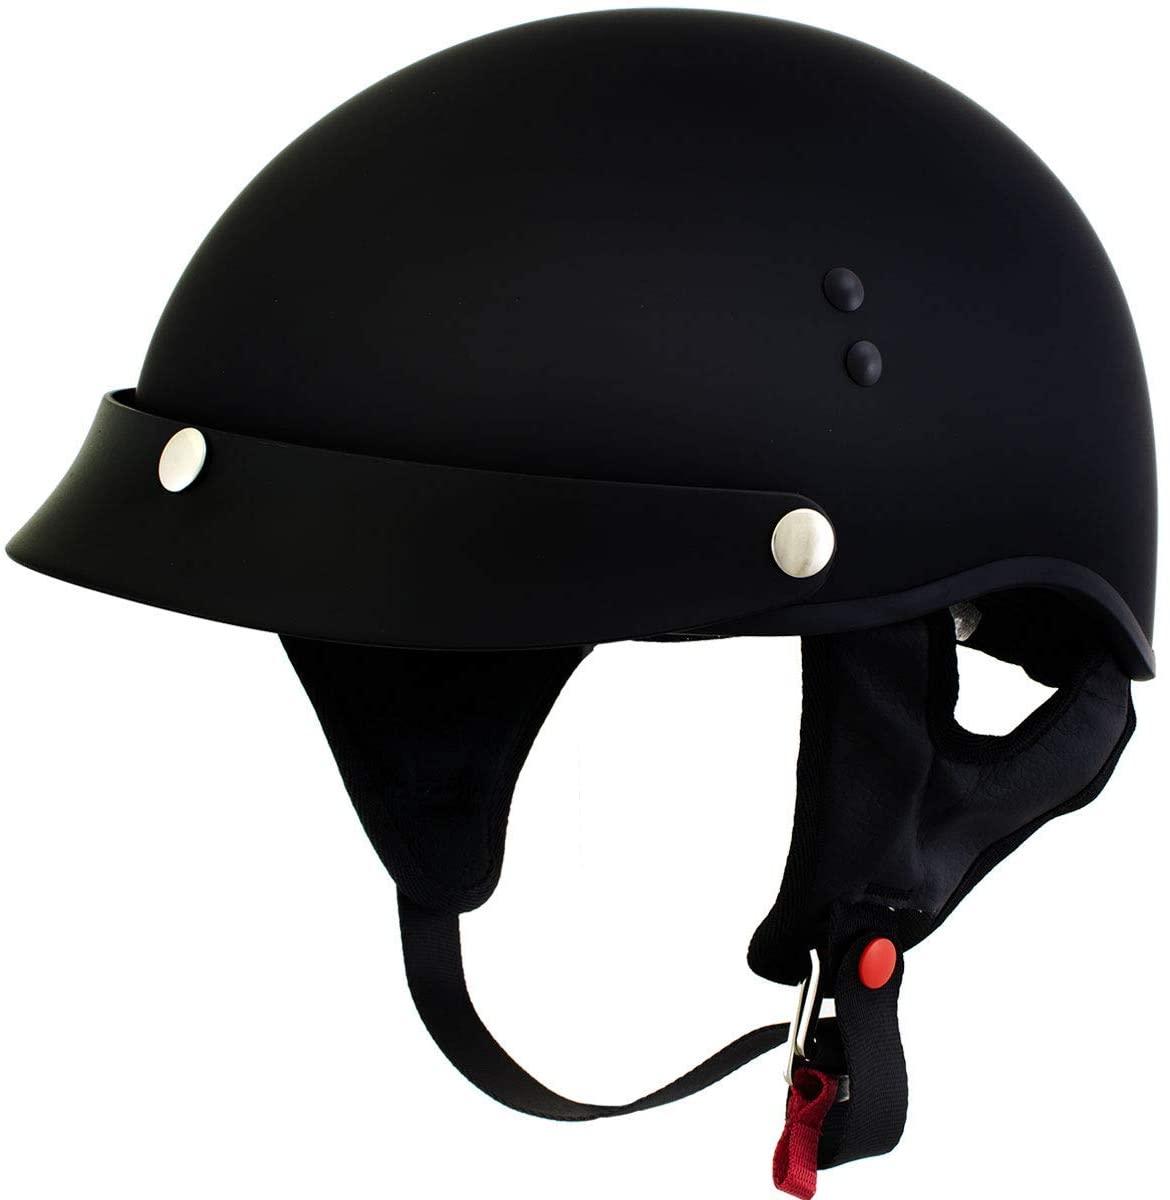 Outlaw T70 'Stealth'Advanced DOT Solid Flat Black Half Motorcycle Skull Helmet - X-Large